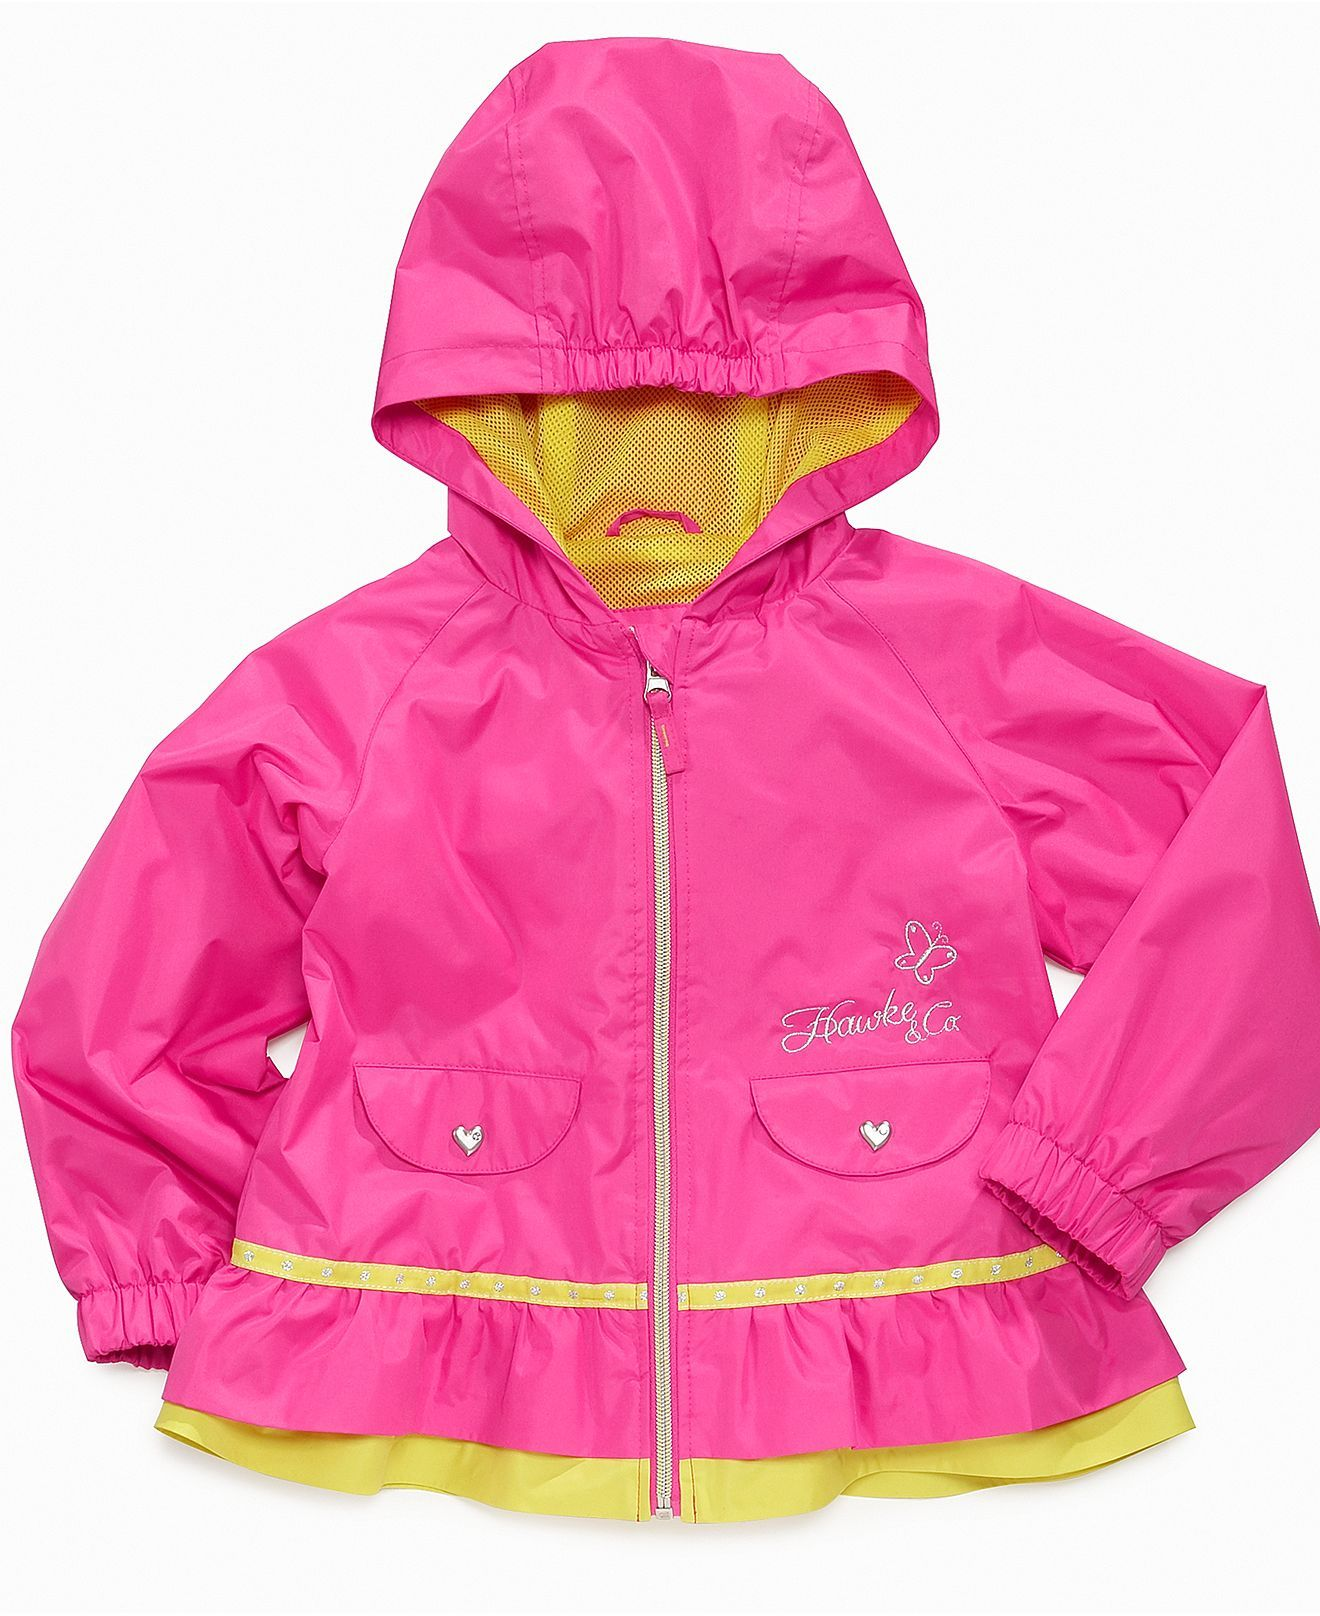 6f22f8b3 Hawke & Co. Kids Coat, Toddler Girls Rain Jacket - Kids - Macys ...